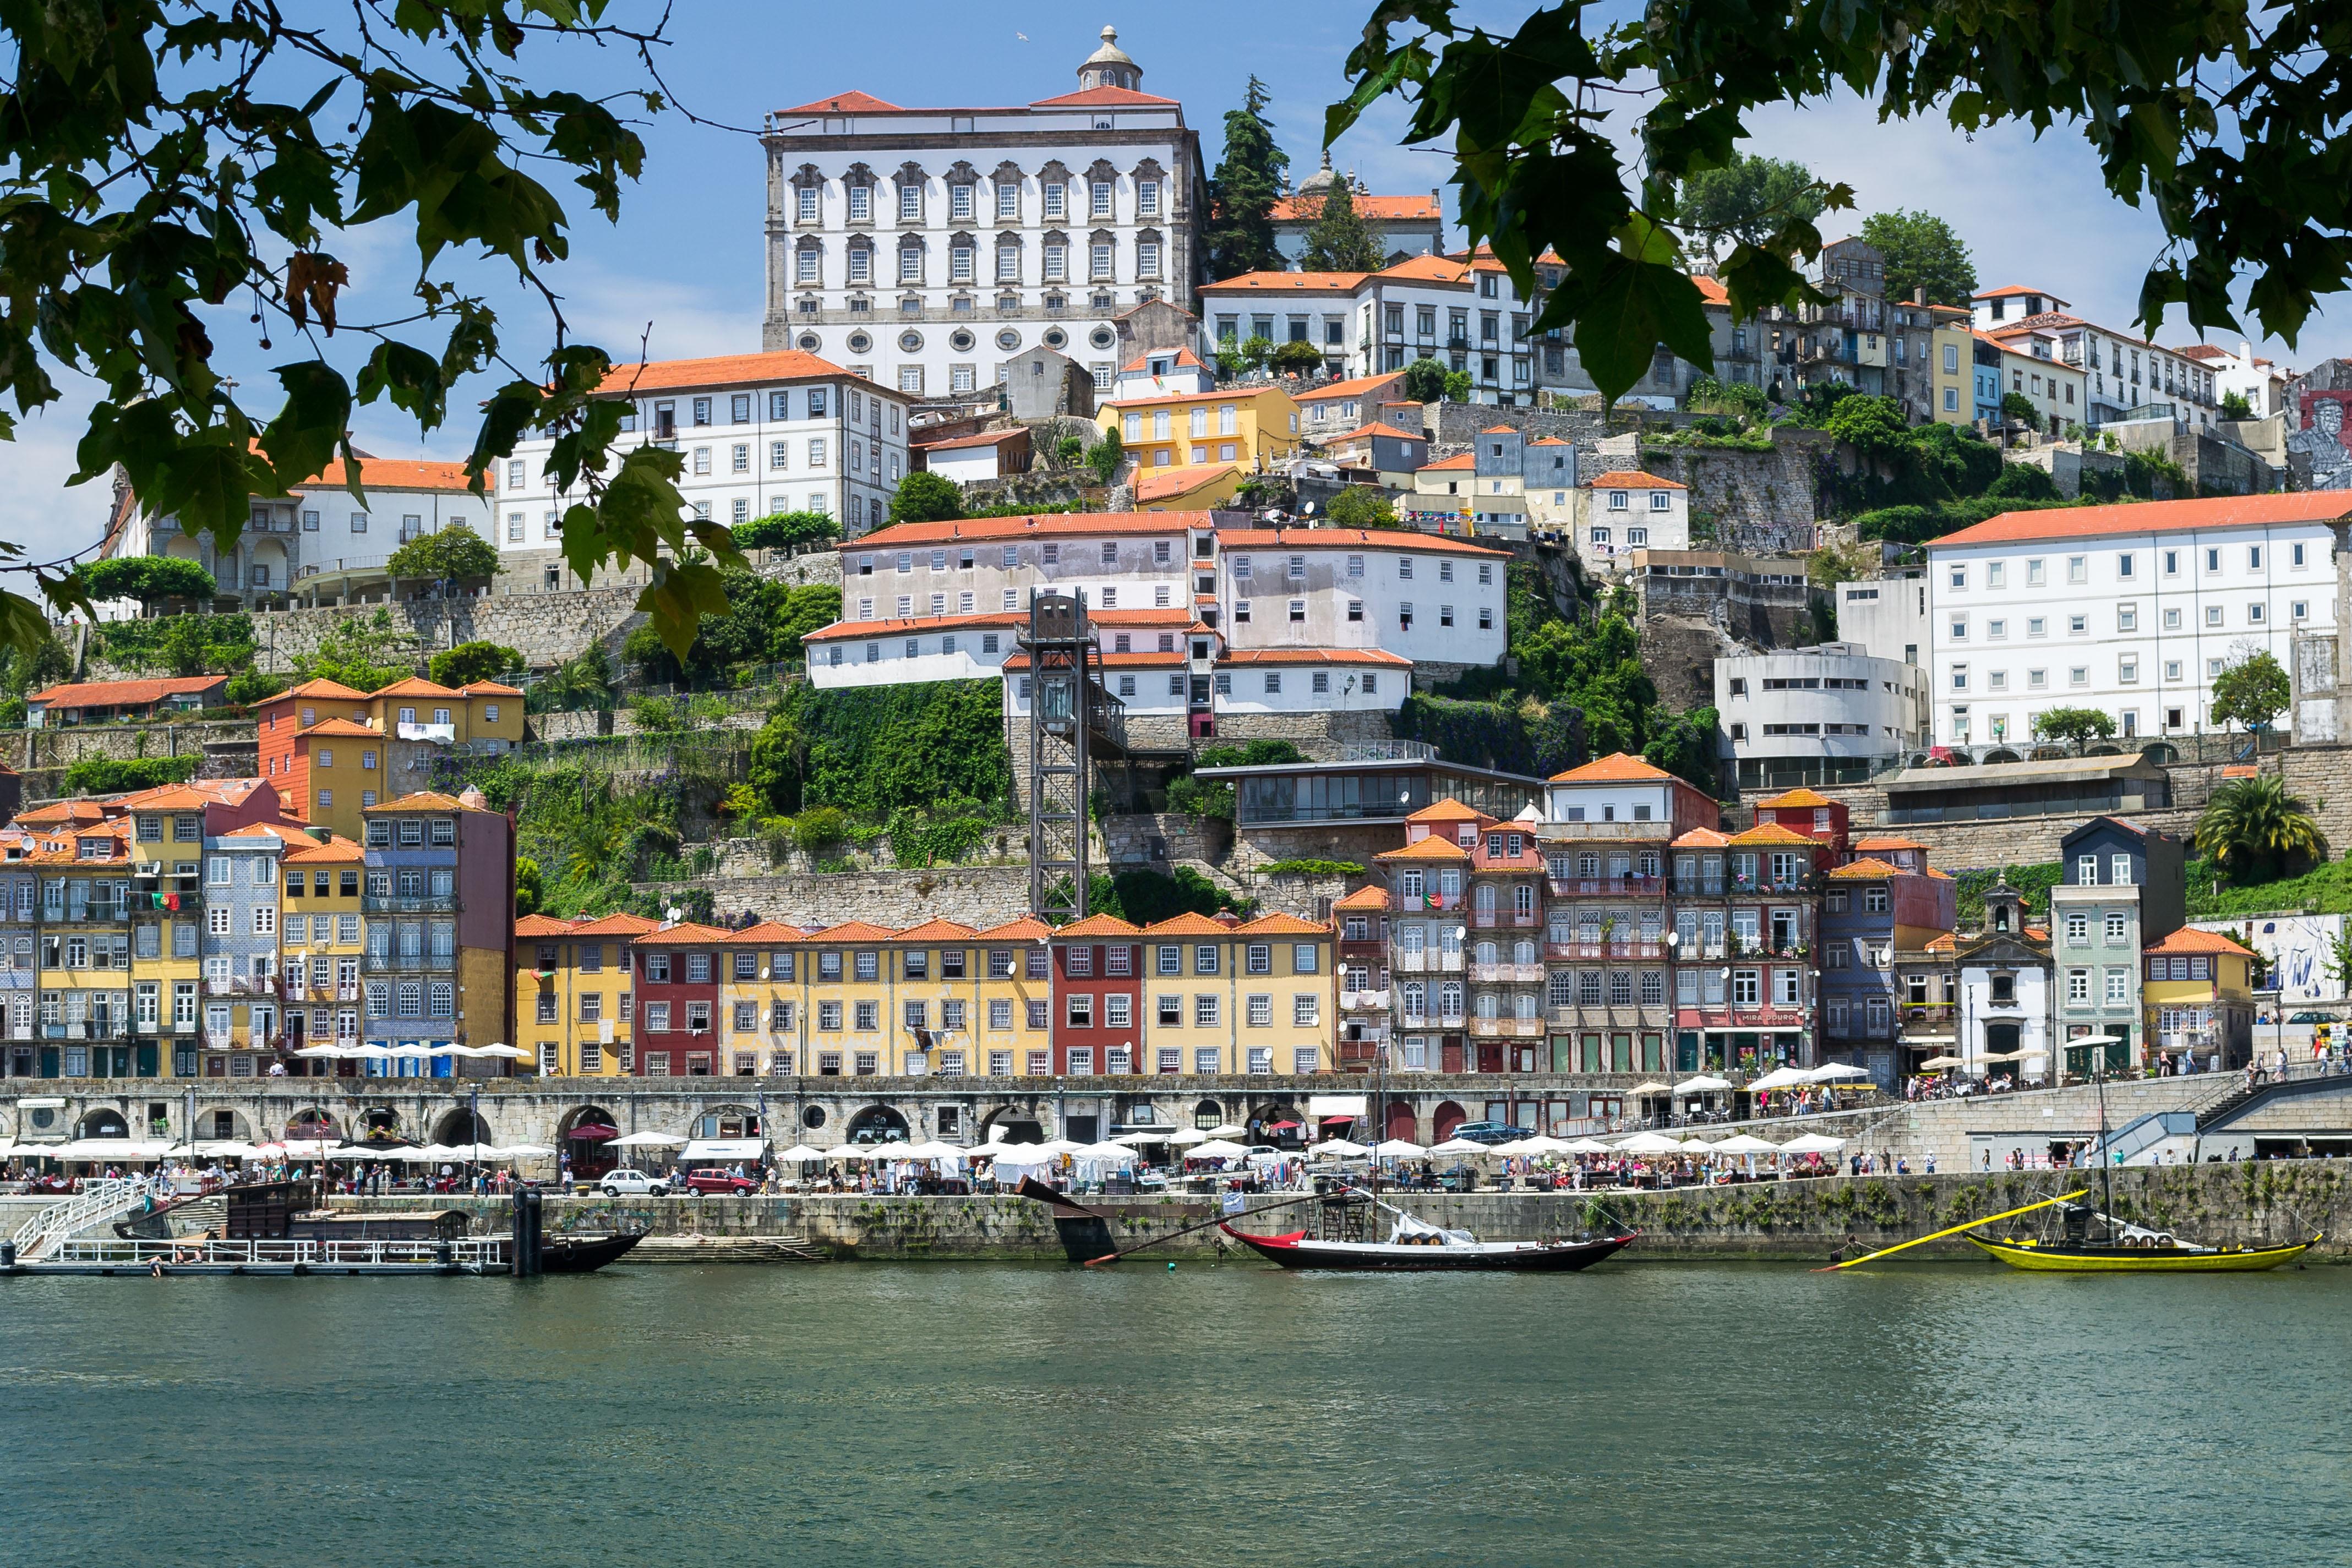 Fluss In Portugal kostenlose foto meer stadtbild ferien fahrzeug hafen